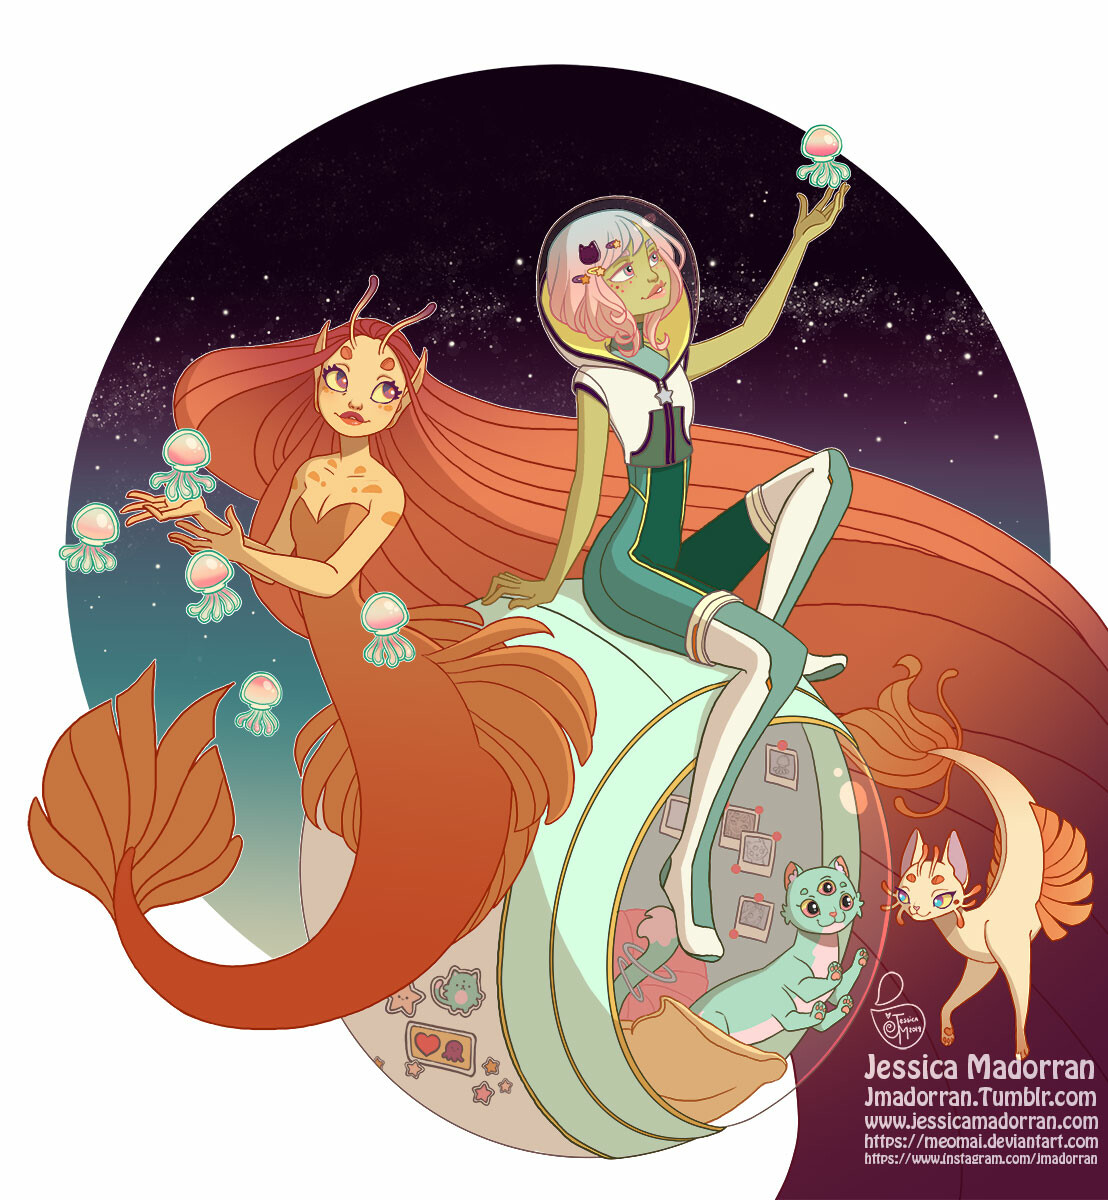 Jessica madorran character design space cat comic character illustration 2019 artstation01